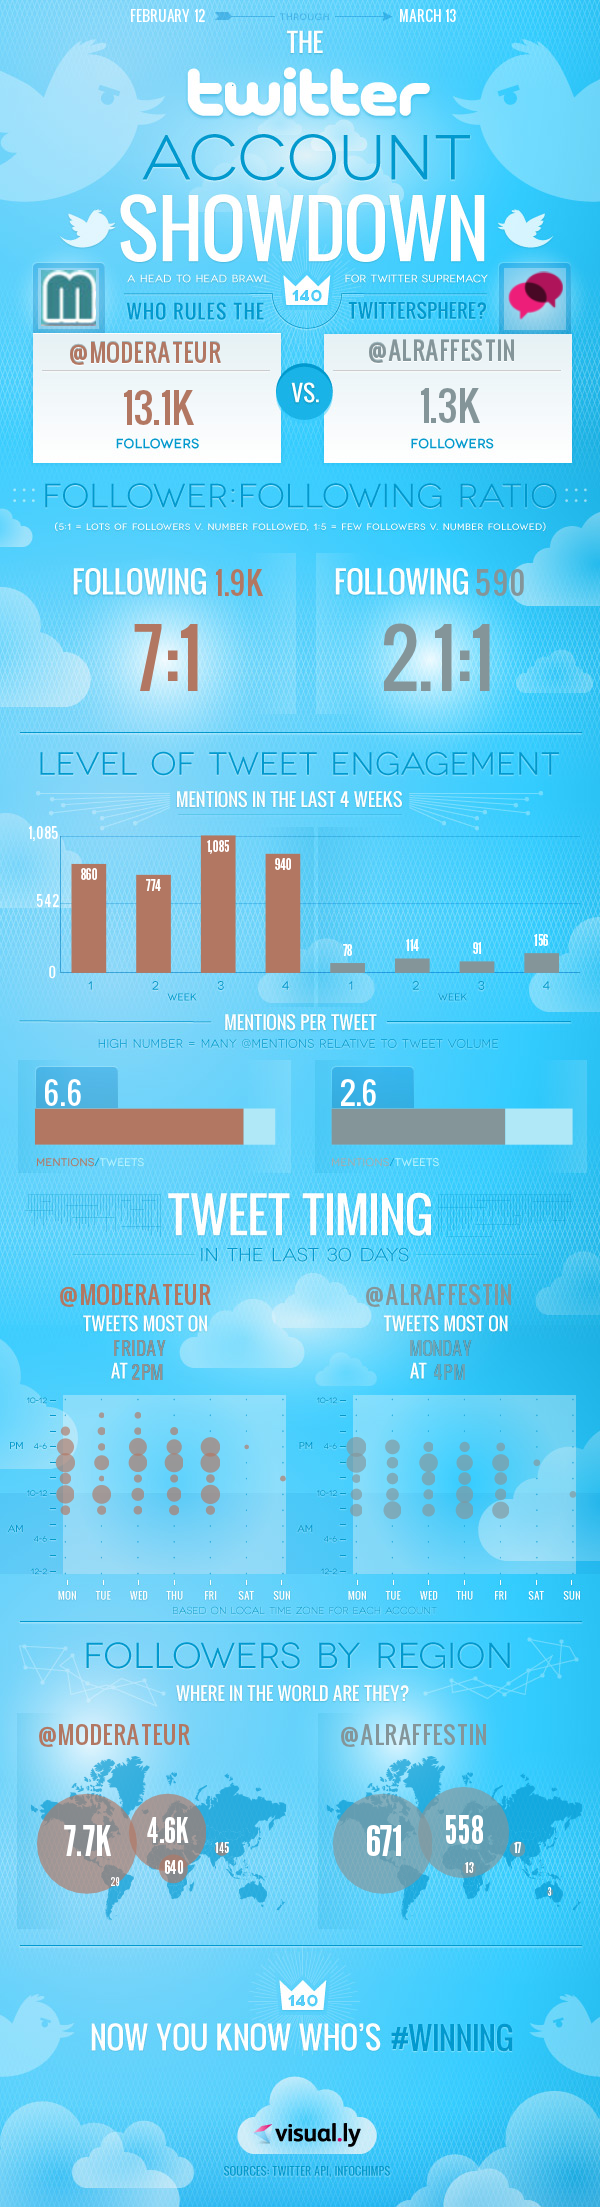 infographie-moderateur-alraffestin